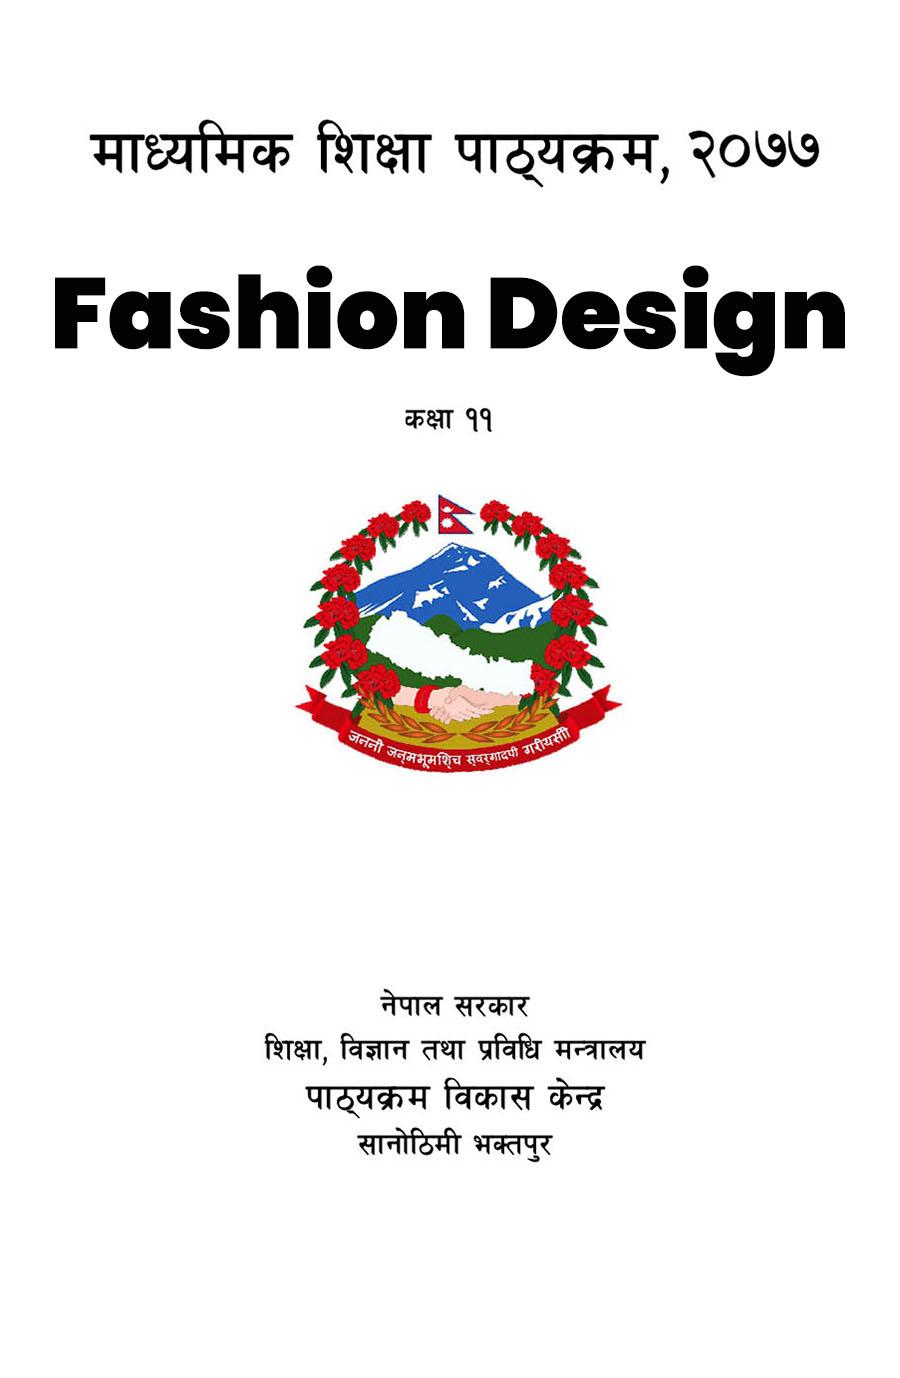 Grade-11-XI-Fashion-Design-Curriculum-Subject-Code-Fad325-2077-DOWNLOAD-in-PDF